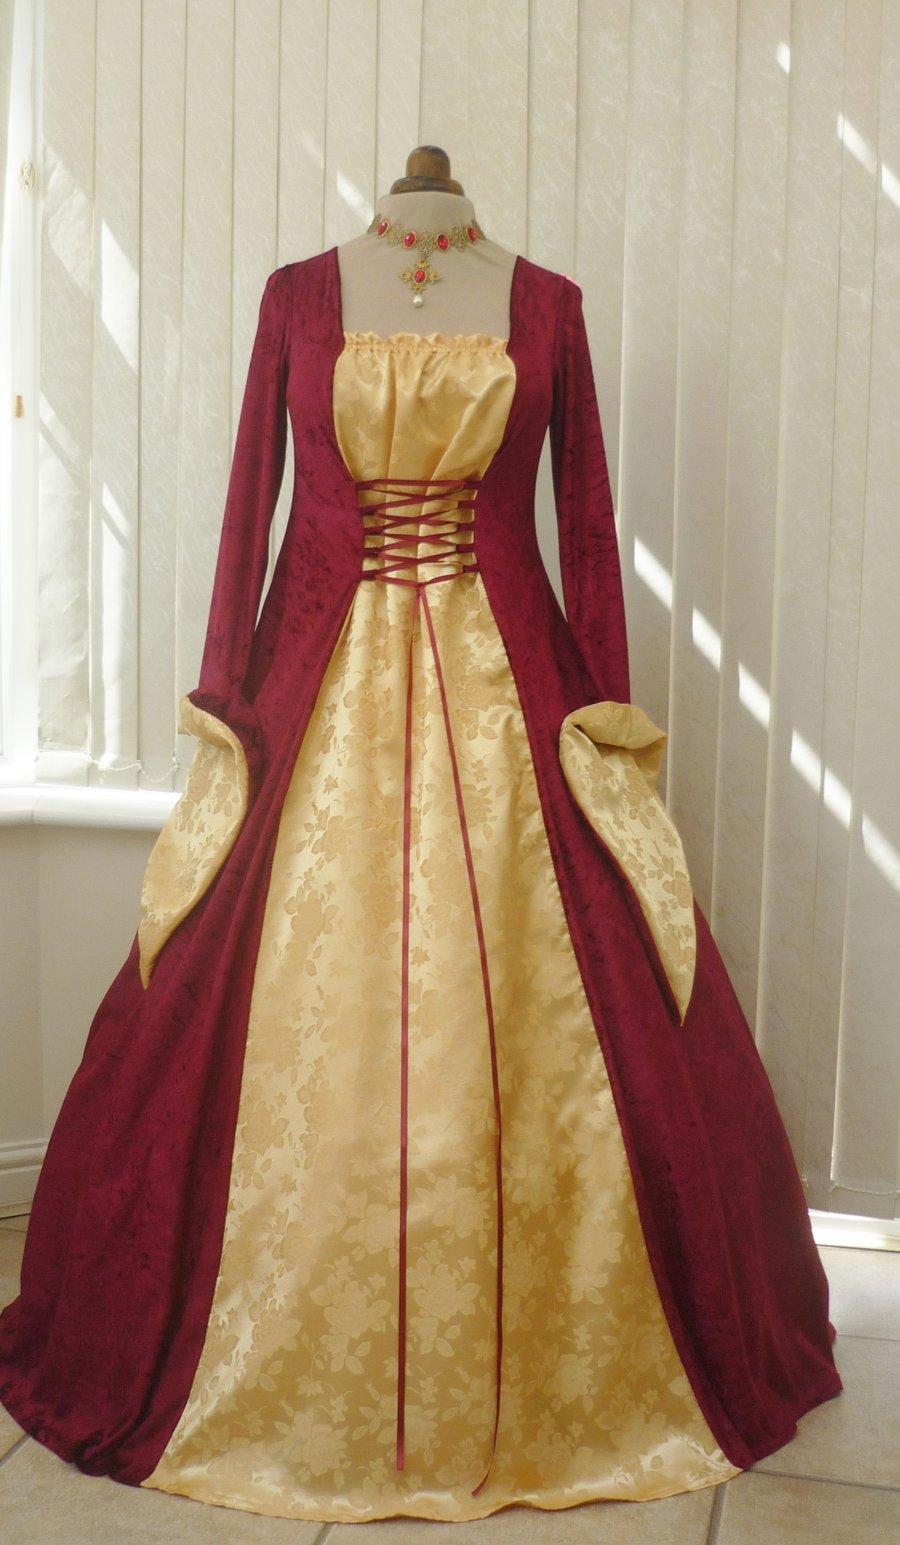 Medieval Gowns  DressedUpGirlcom